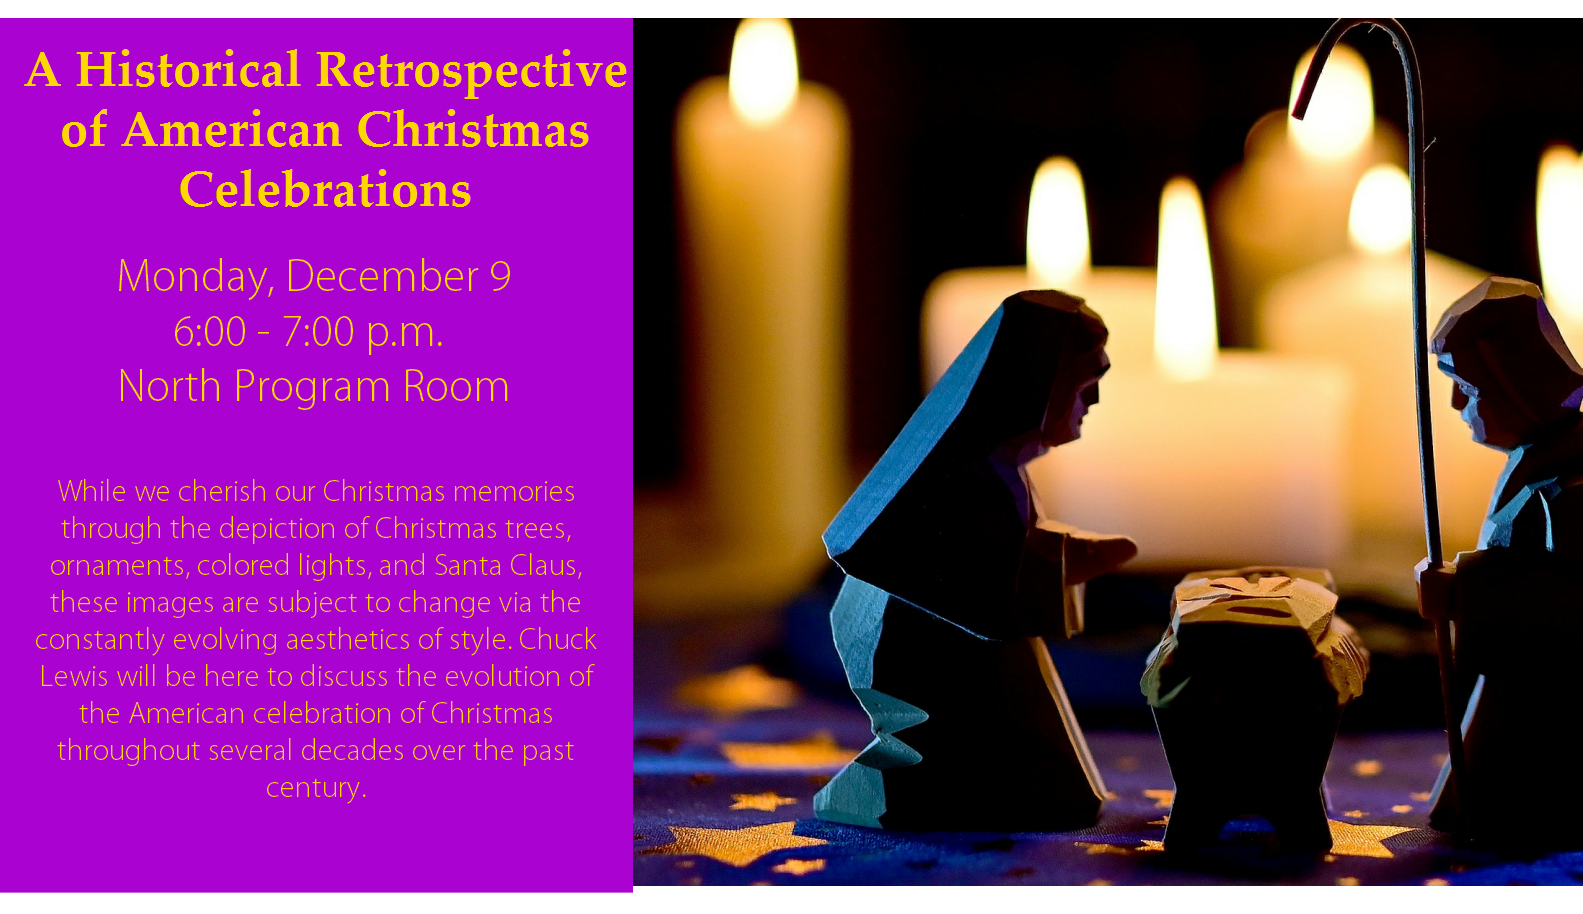 A Historical Retrospective of American Christmas Celebrations